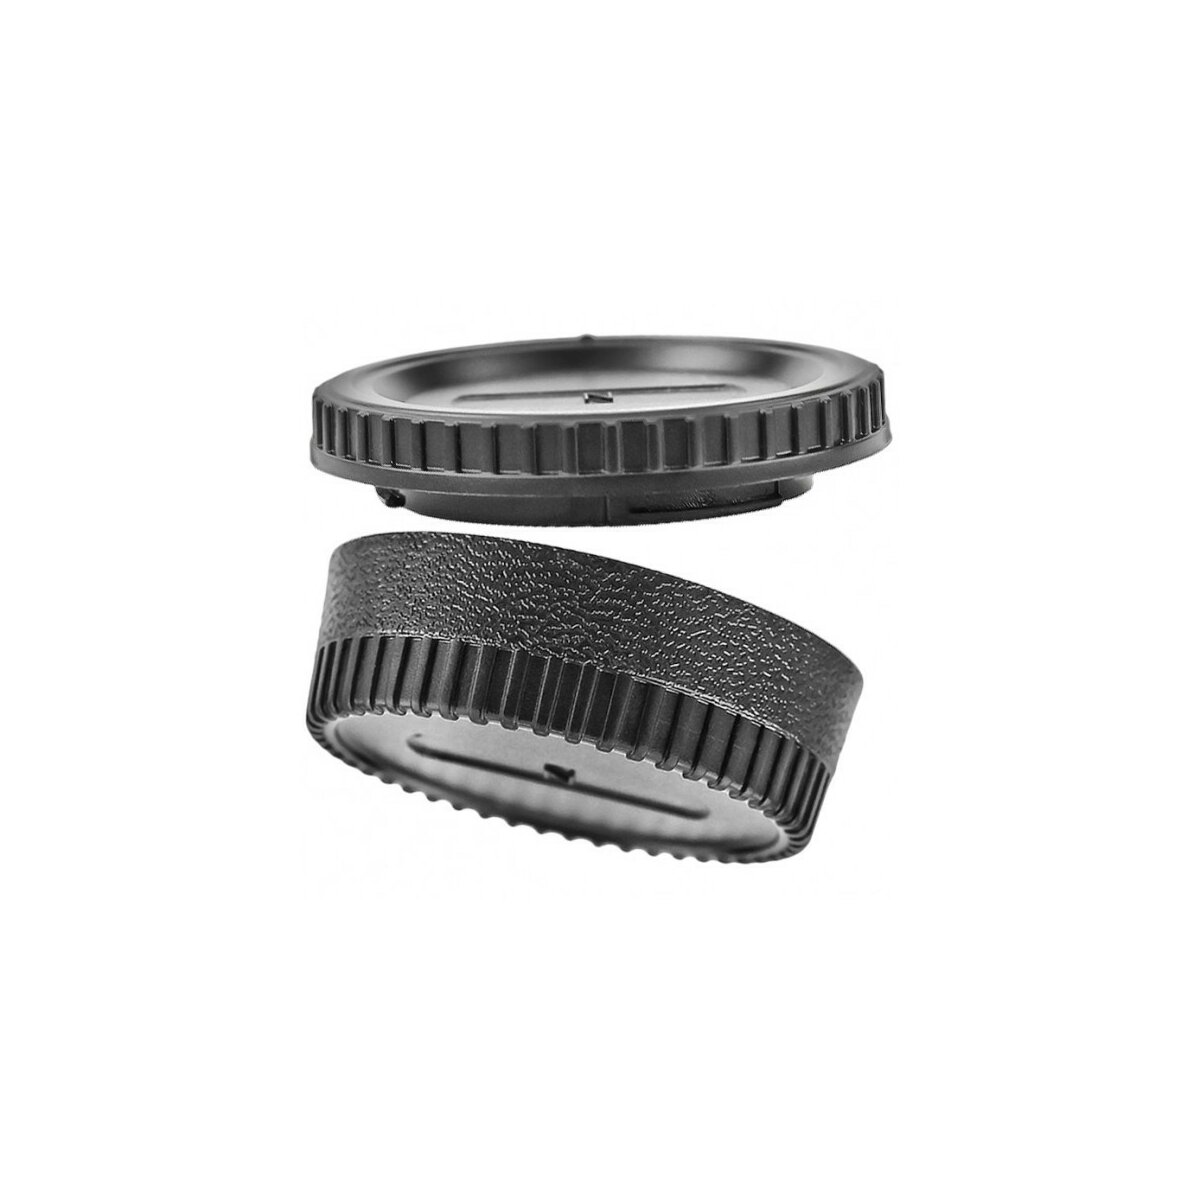 Back Cover for Body And Lens of Nikon DSLR Reflex Cameras